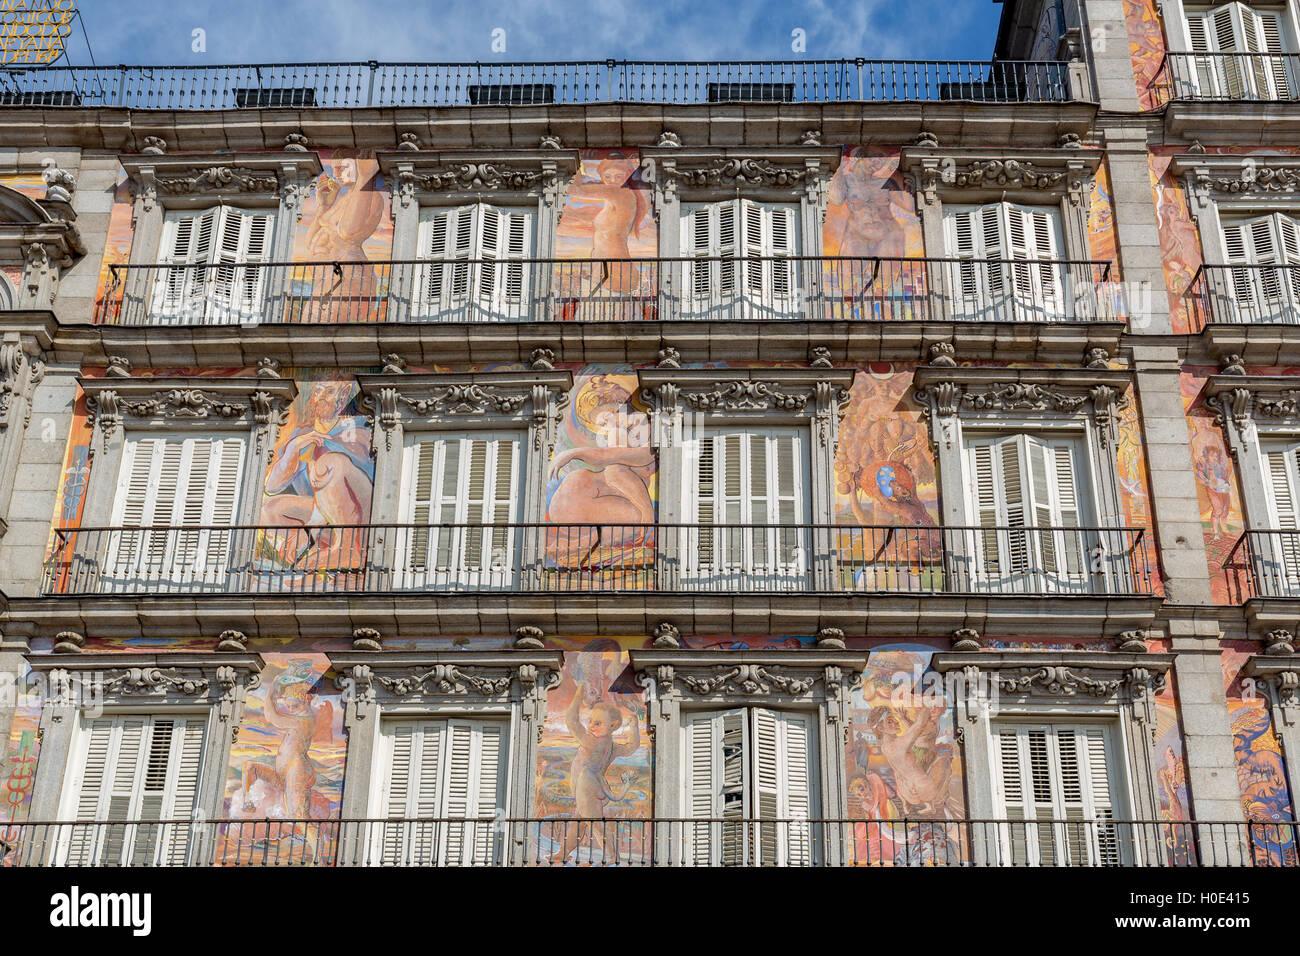 Casa de la Panaderia, Plaza Mayor, Madrid, Spain Stock Photo